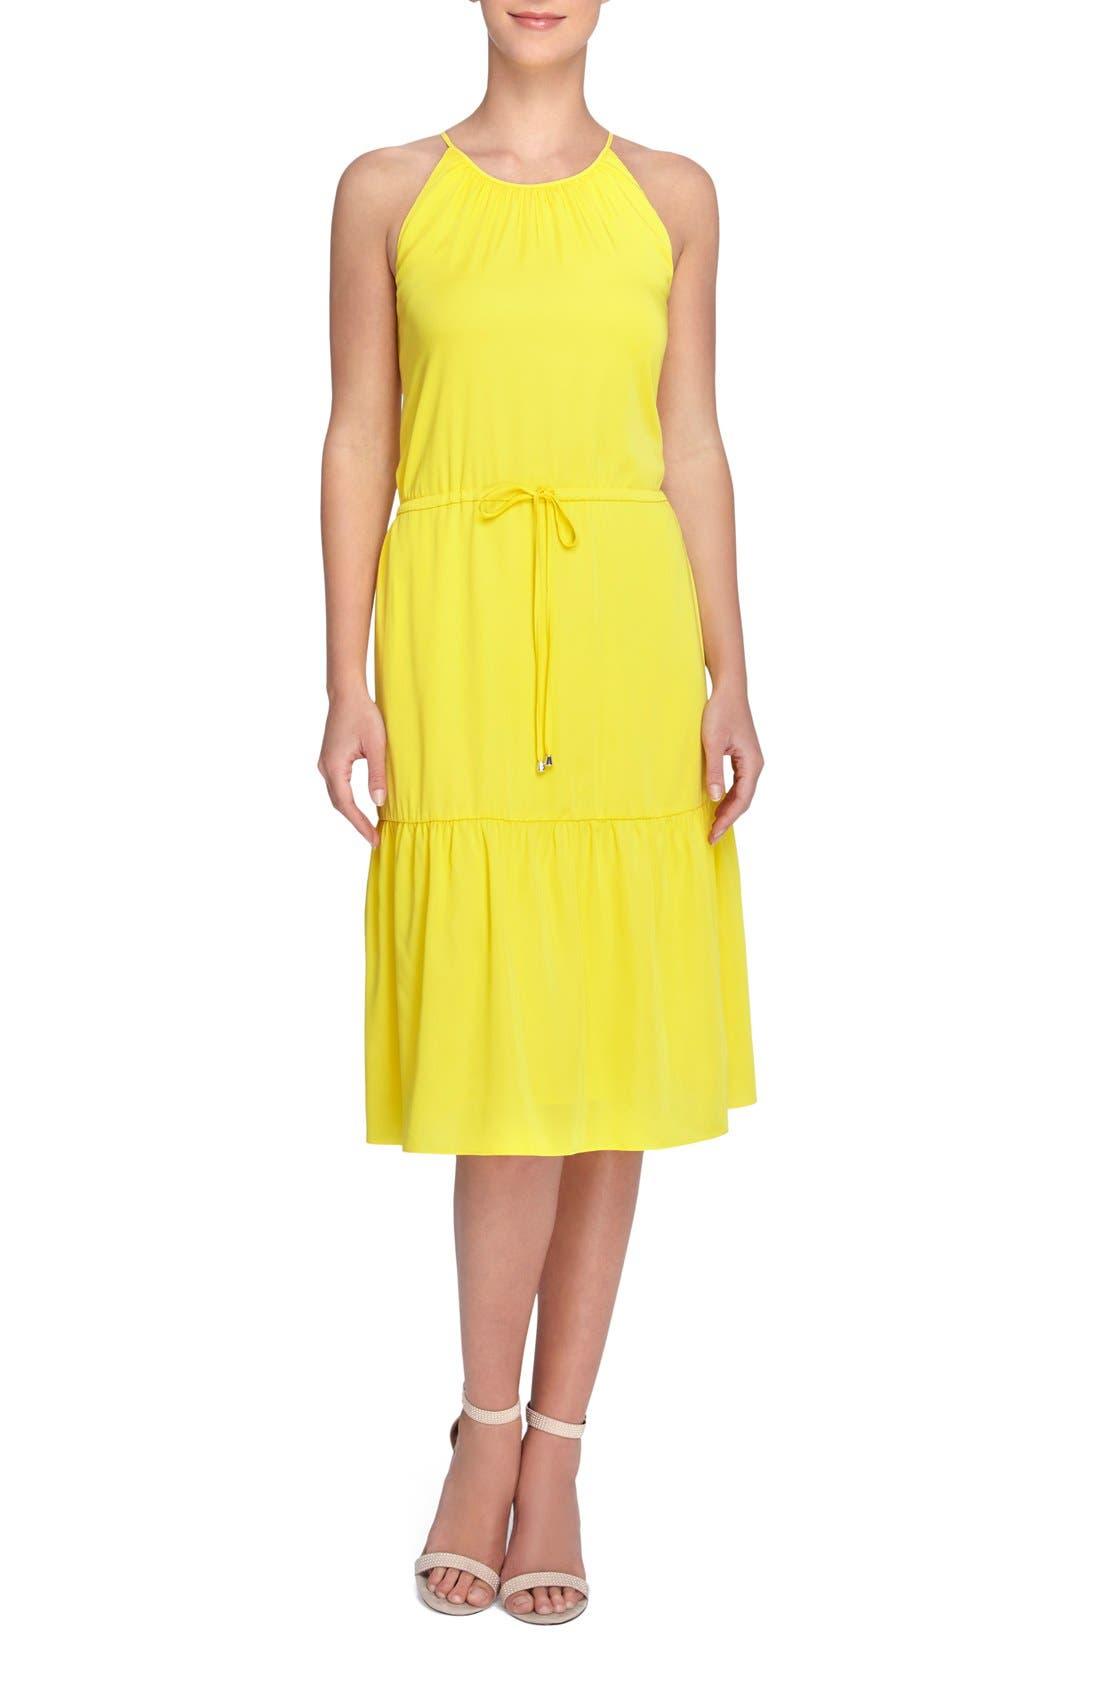 CATHERINE CATHERINE MALANDRINO Devon Halter Style Blouson Dress